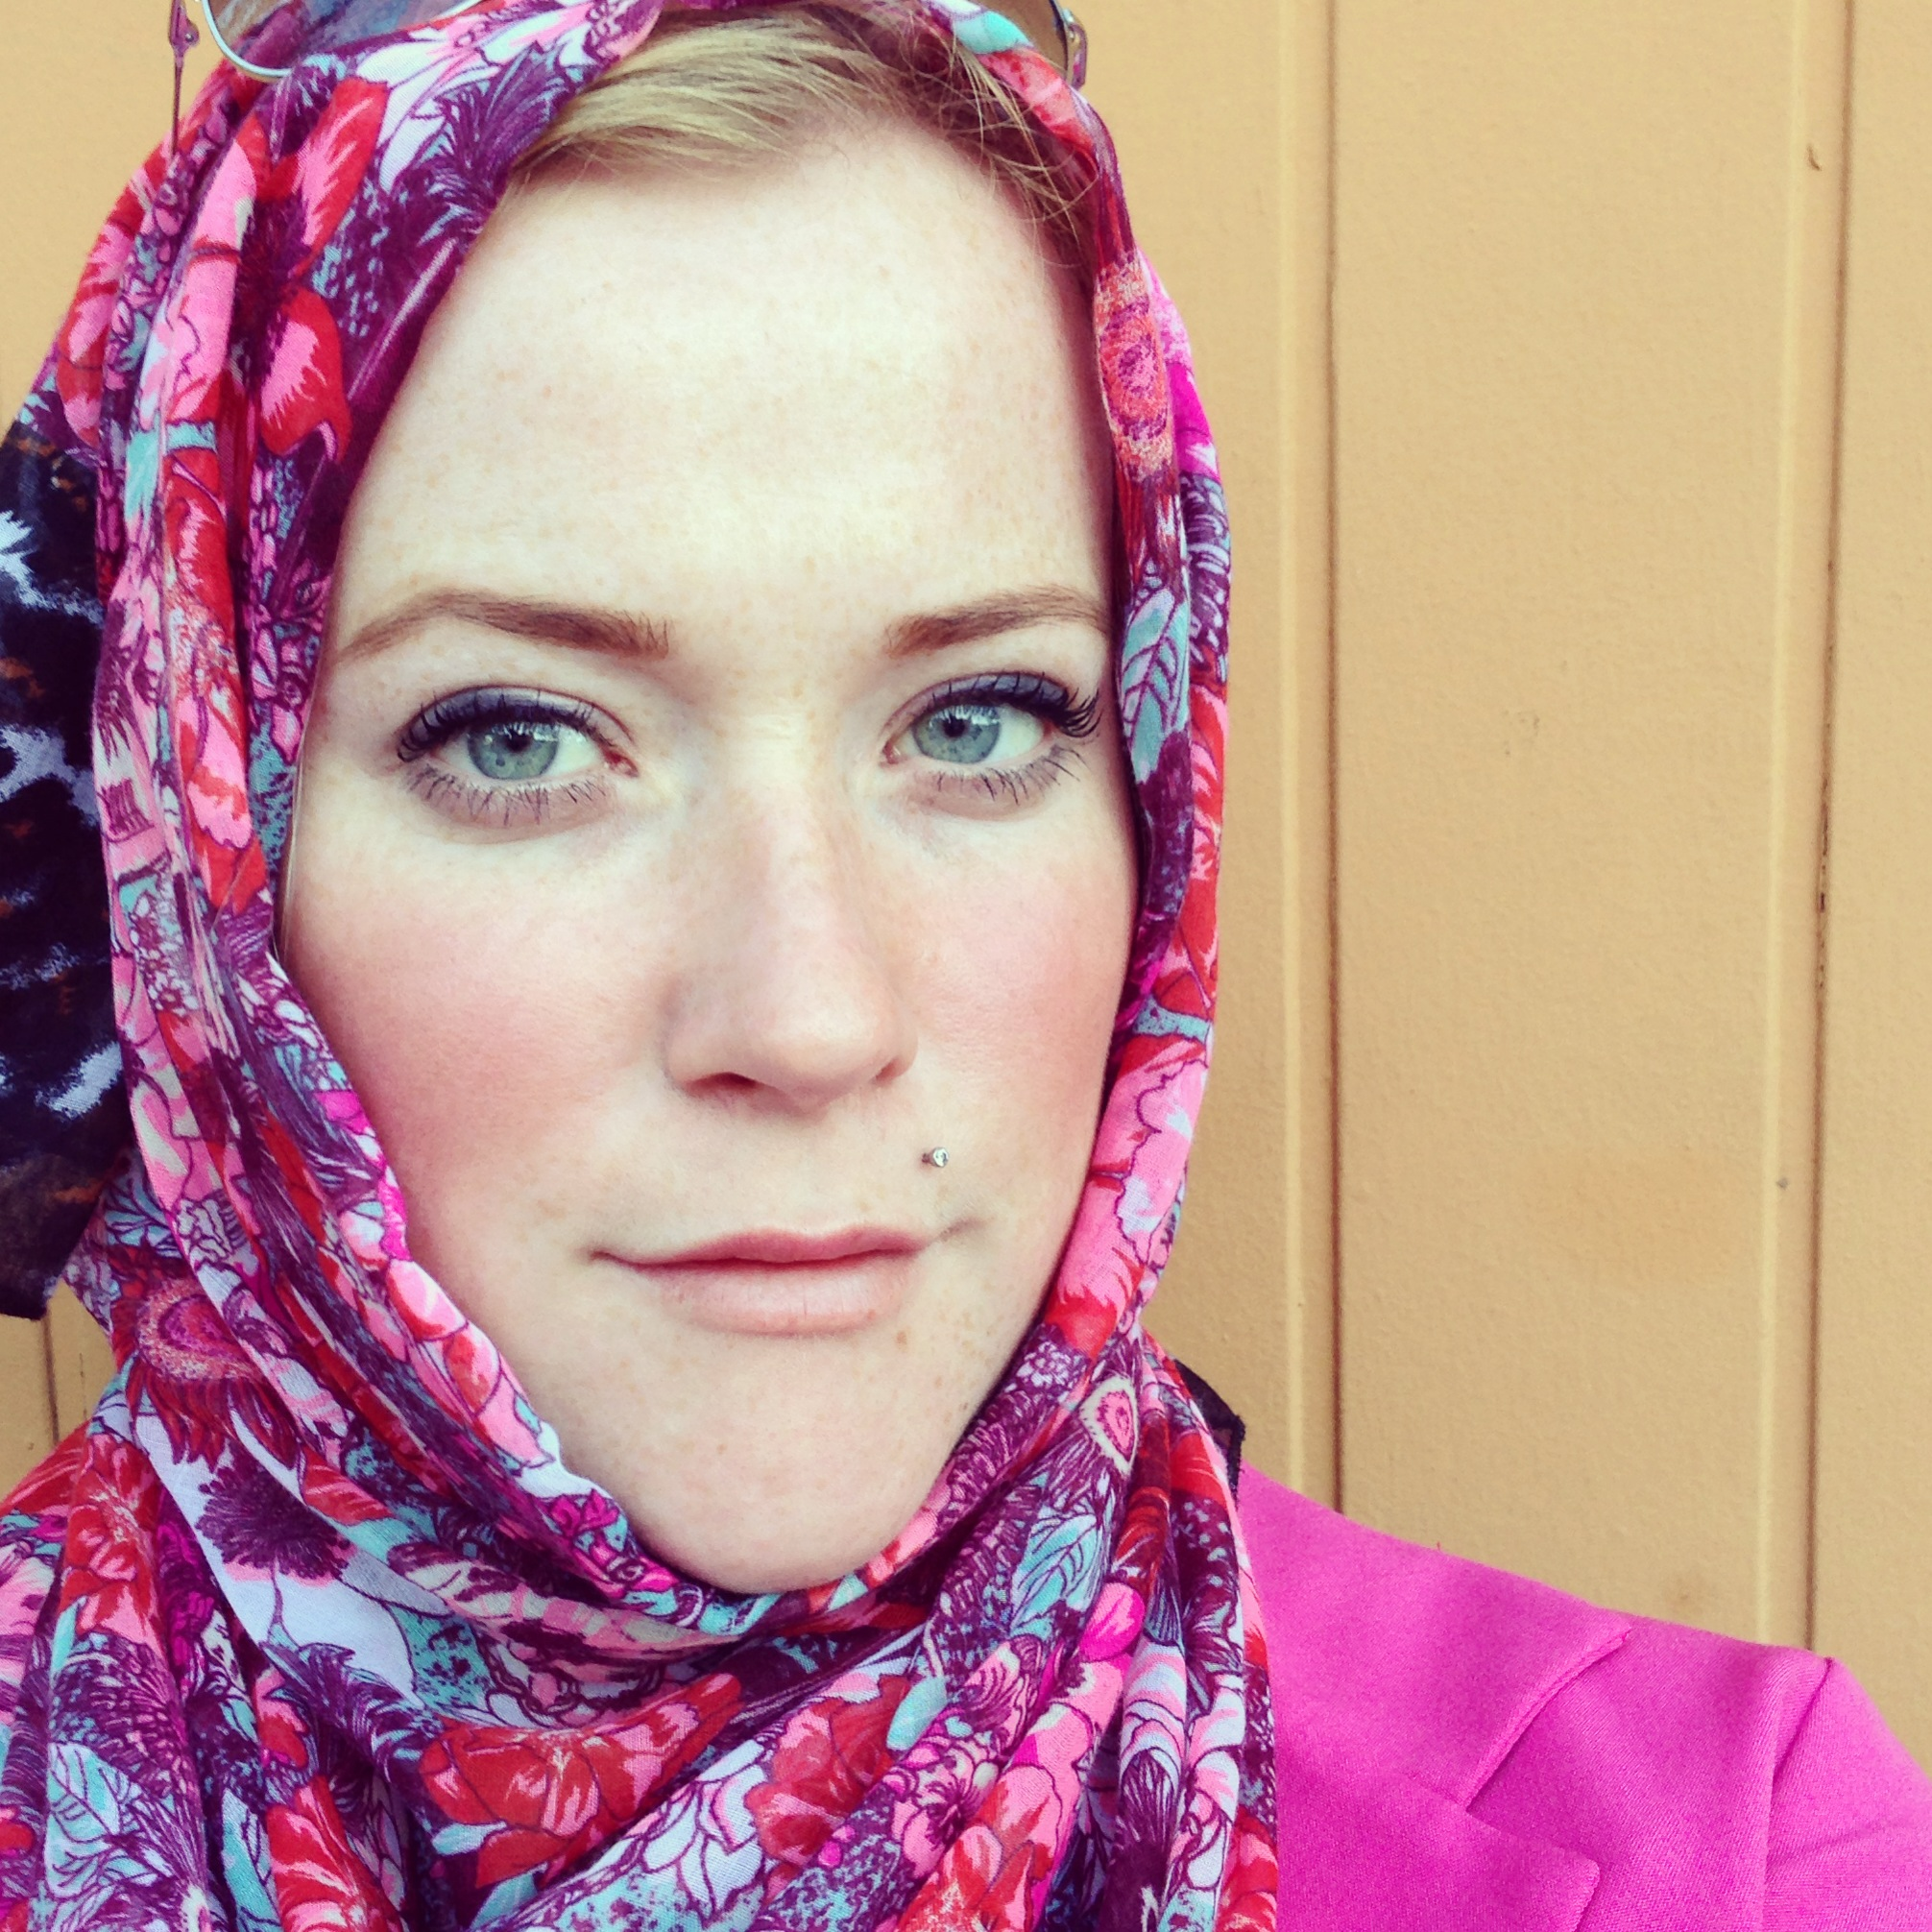 Muslim girls dating with hijab